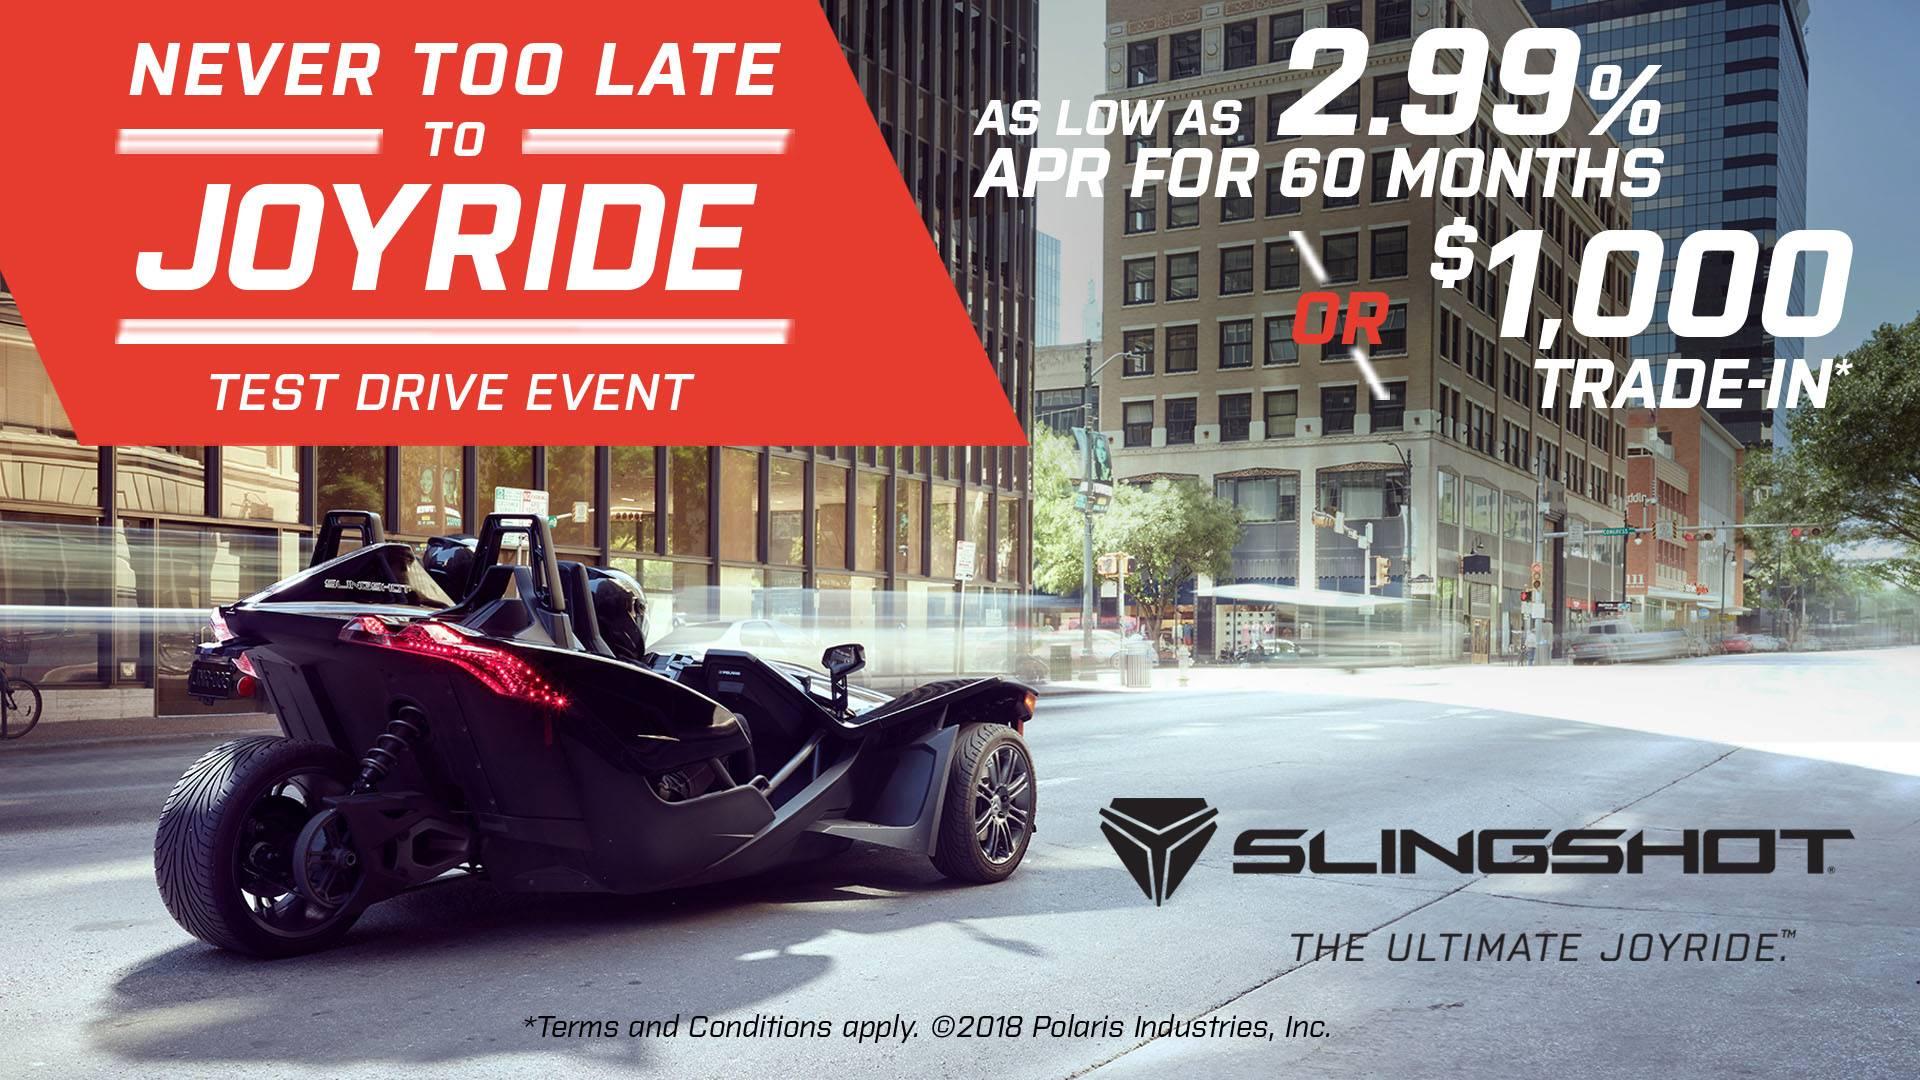 Slingshot Never Too Late to JOYRIDE Test Drive Event